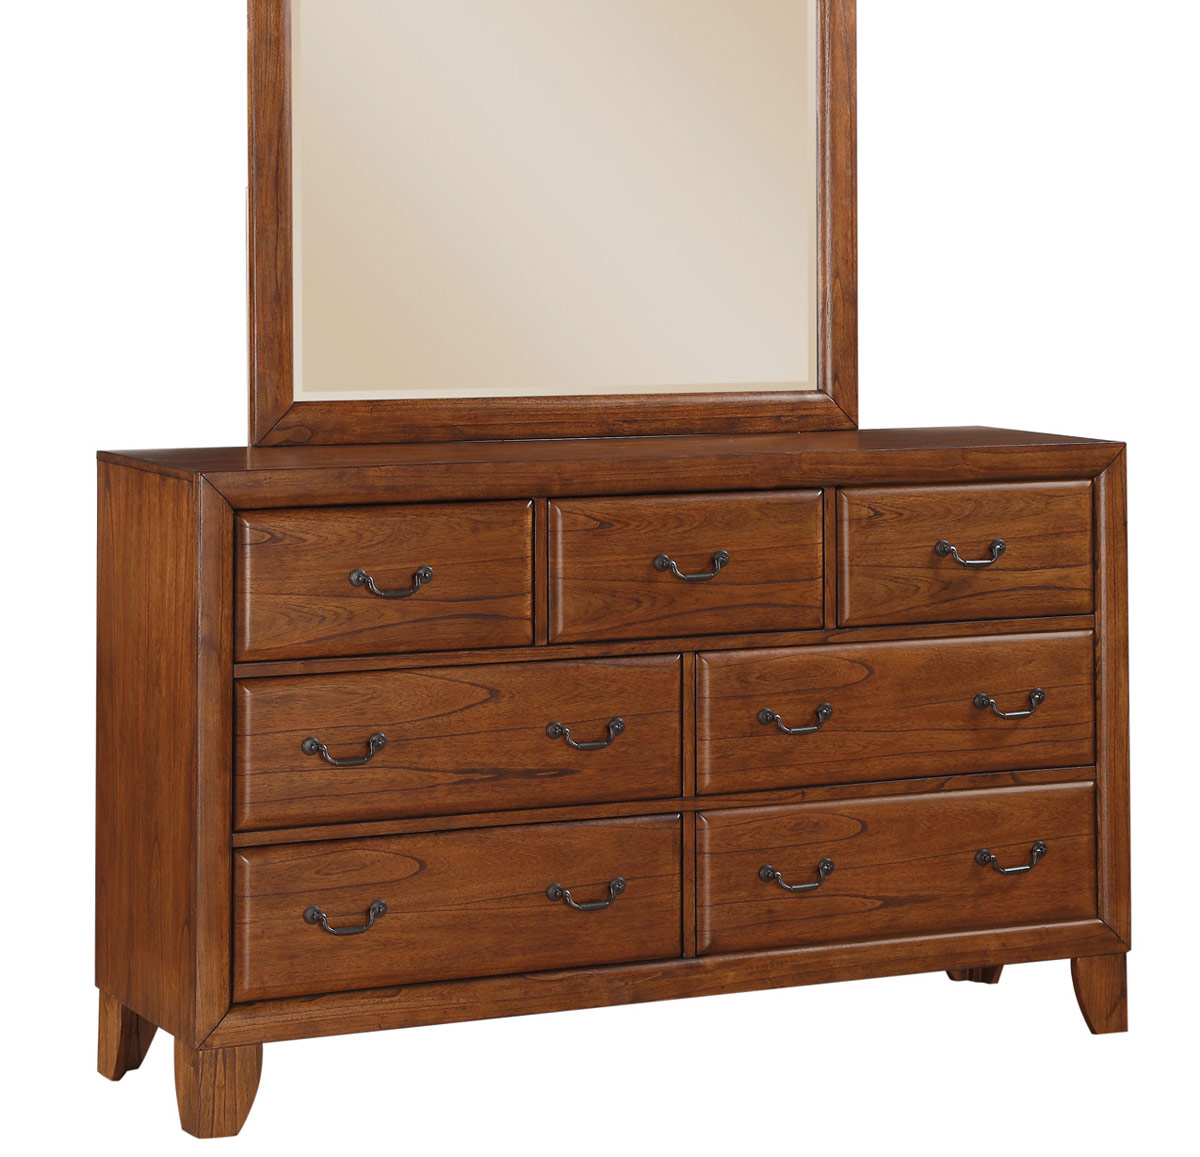 Coaster Willow Creek Dresser - Oak